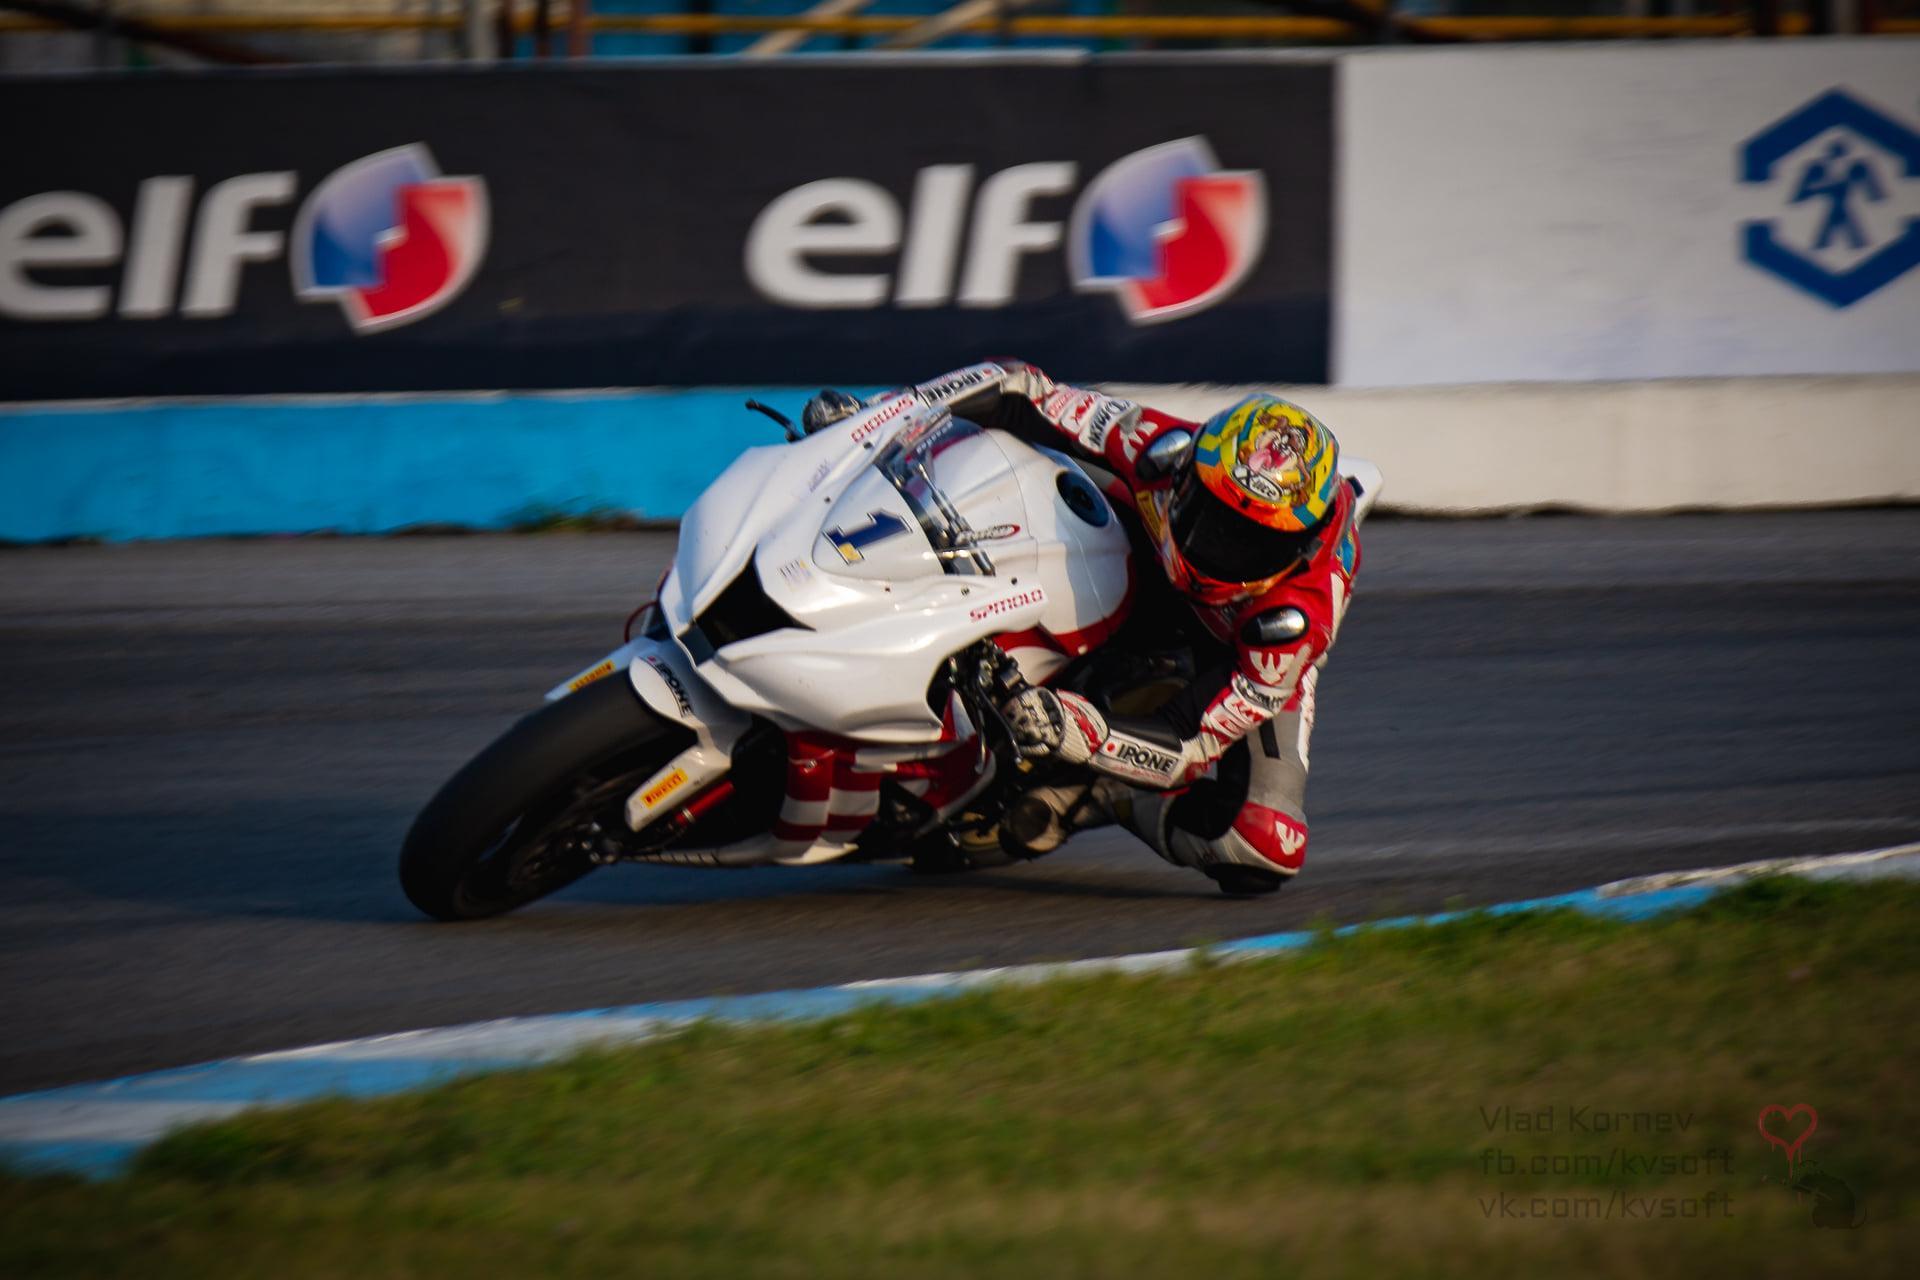 5-6_etap_MotoGPUkraine_039